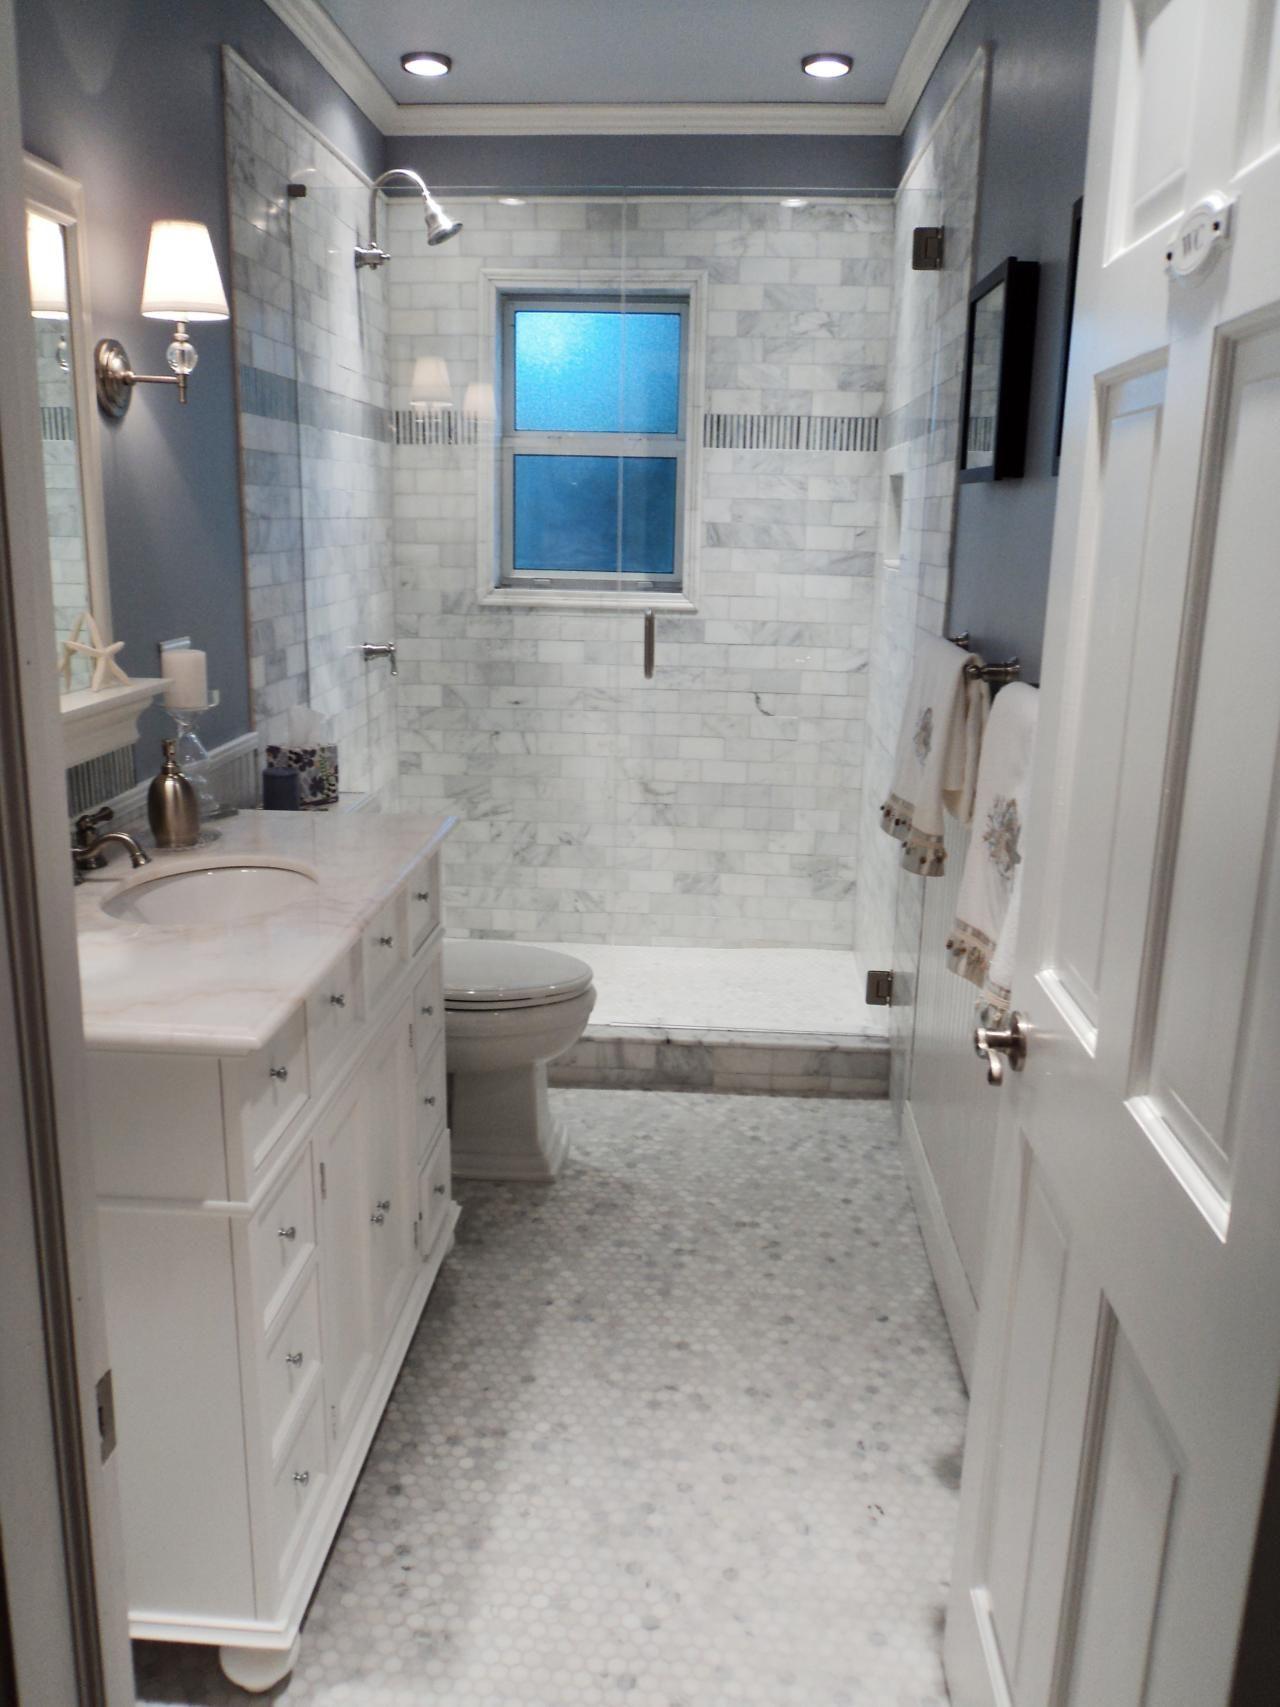 Stylish Bathroom Updates Stylish Bathroom Small Master Bathroom Bathroom Remodel Master